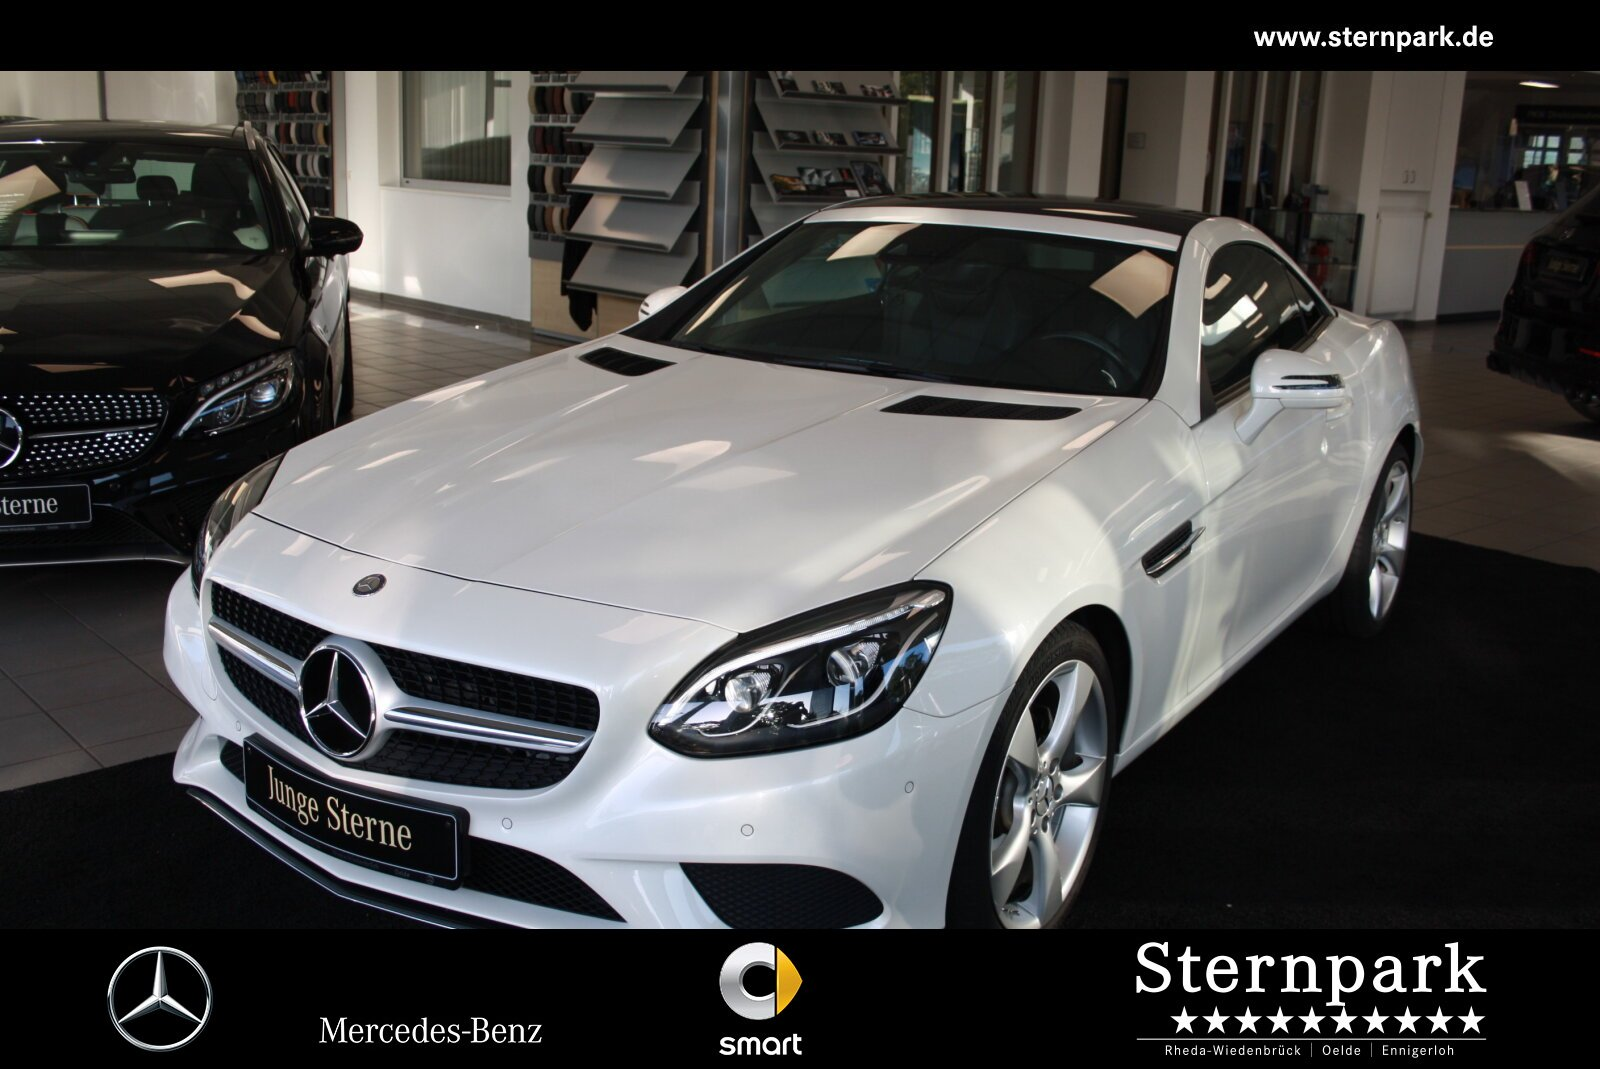 Mercedes-Benz SLC 200 COMAND+Intelligent-Light-LED+Apple-Car-P, Jahr 2017, Benzin